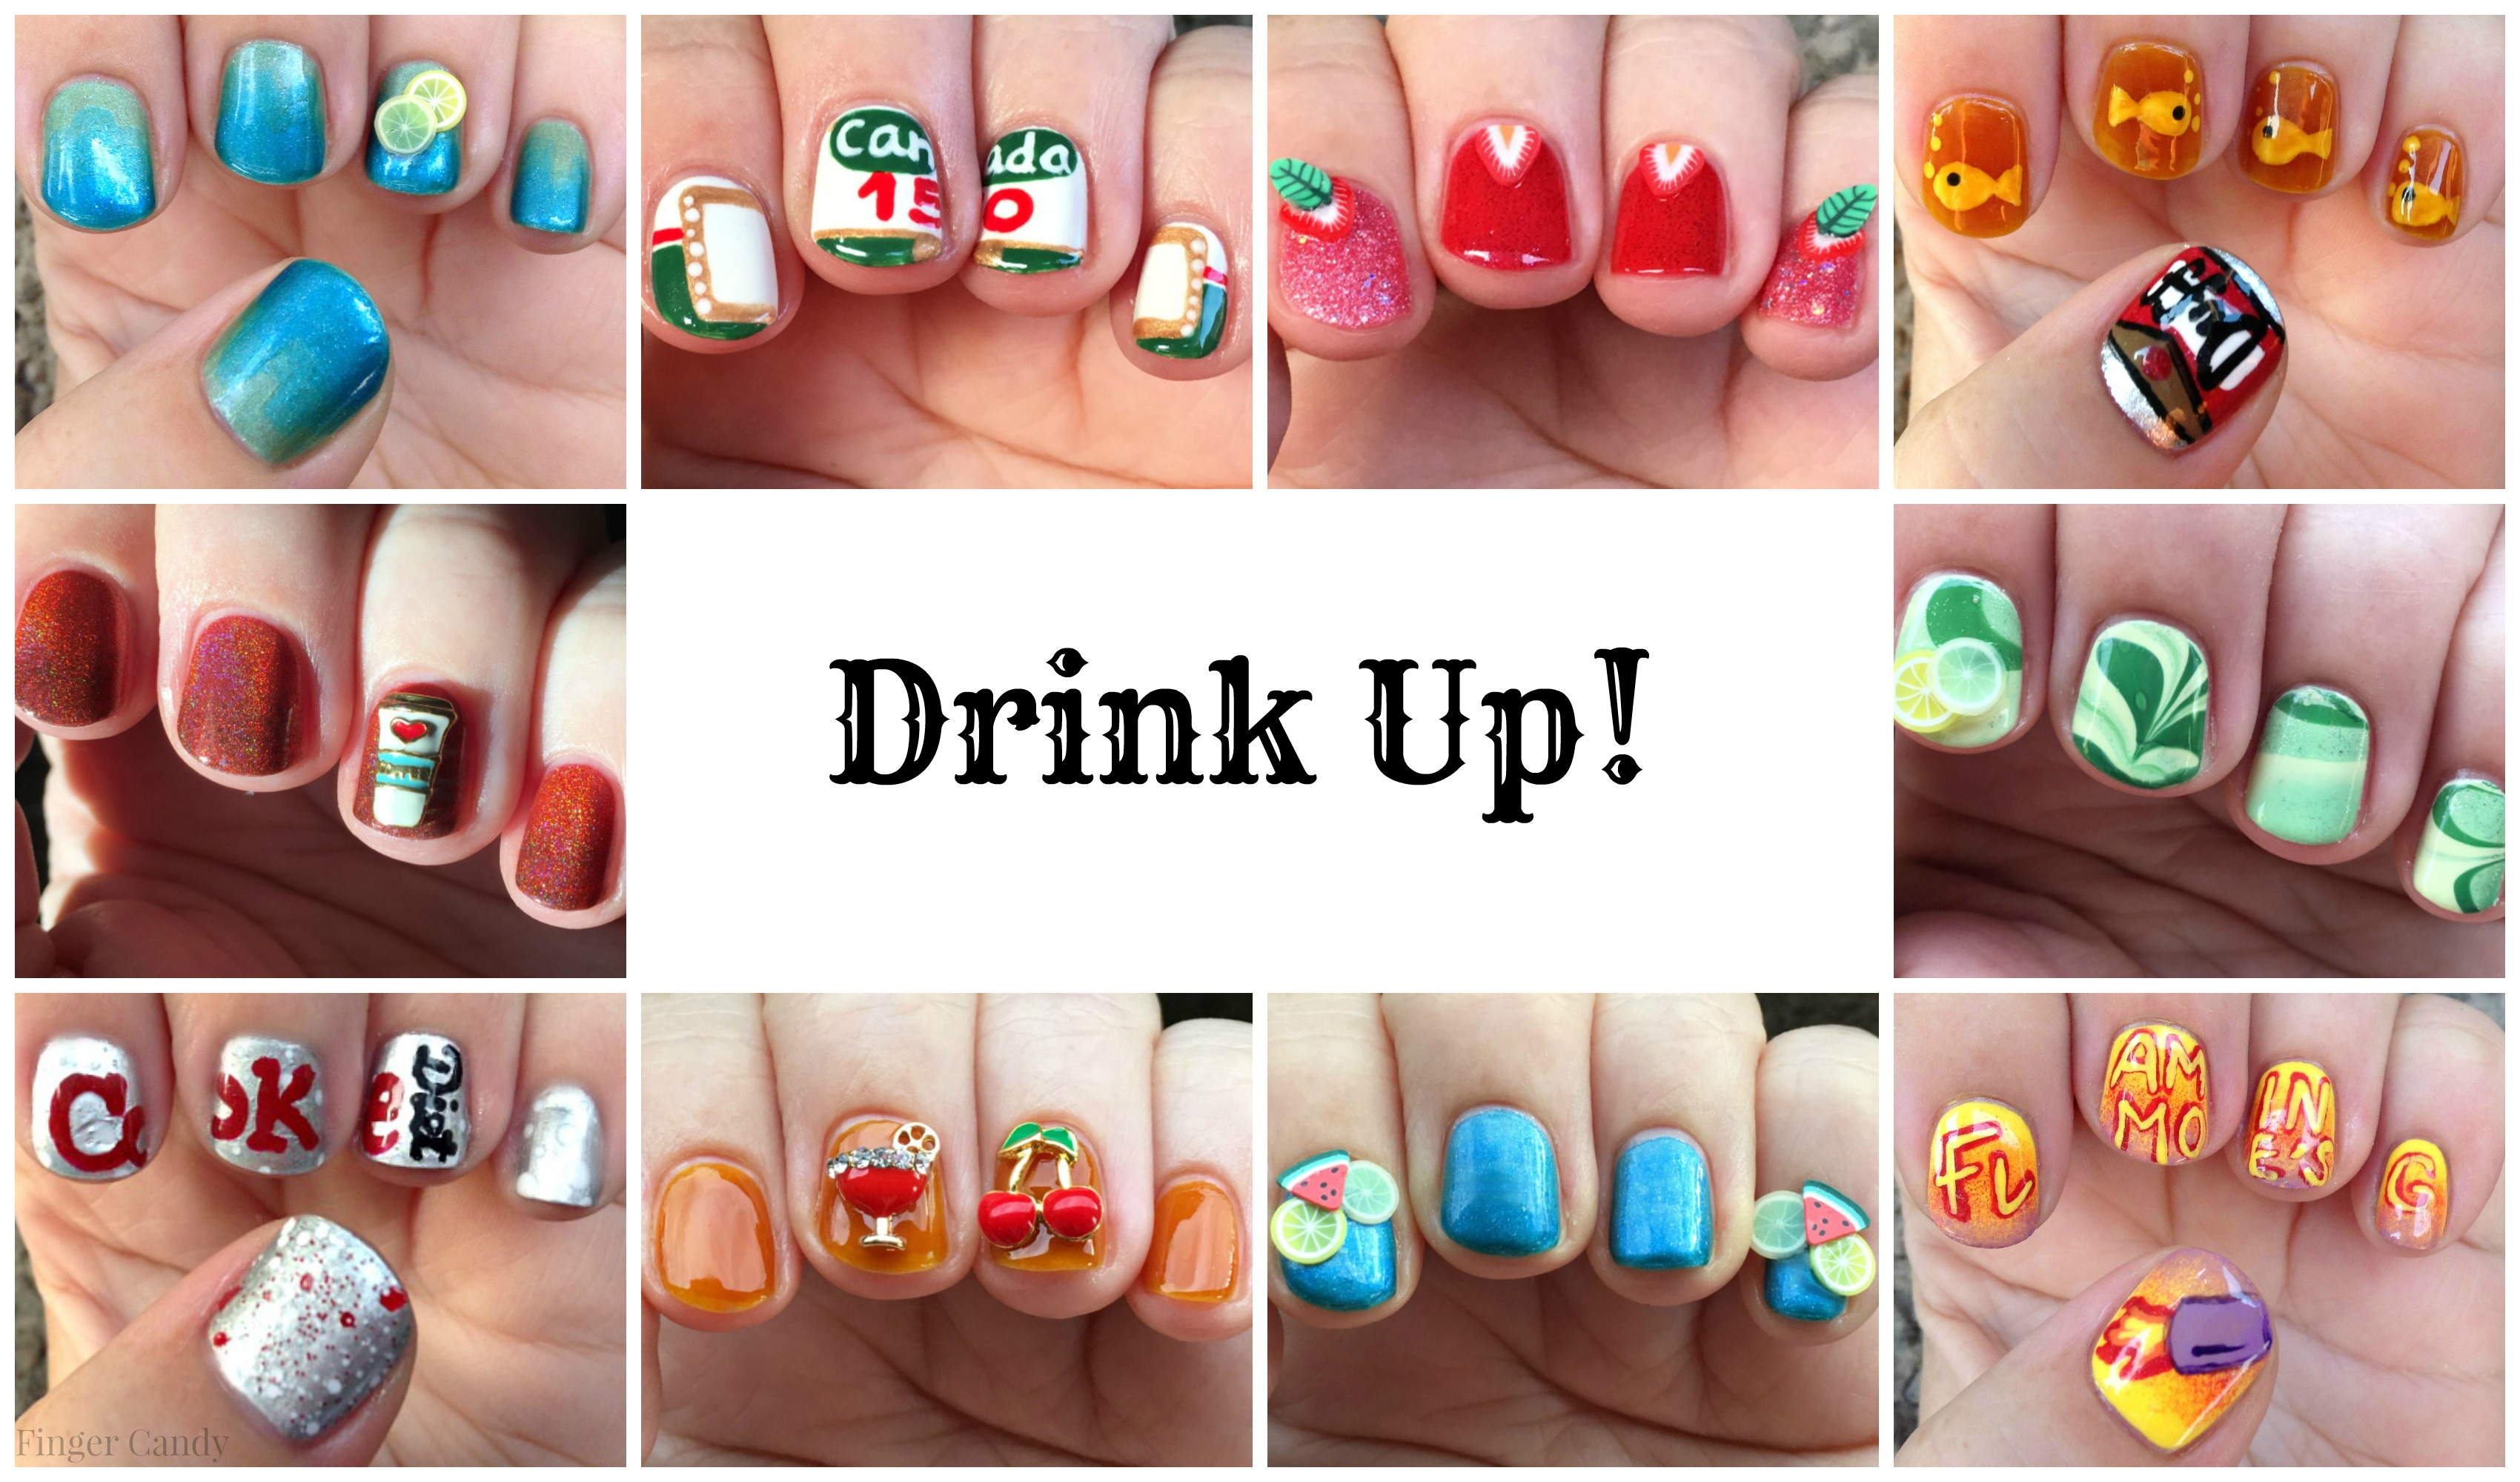 5th Anniversary Beverage Collage